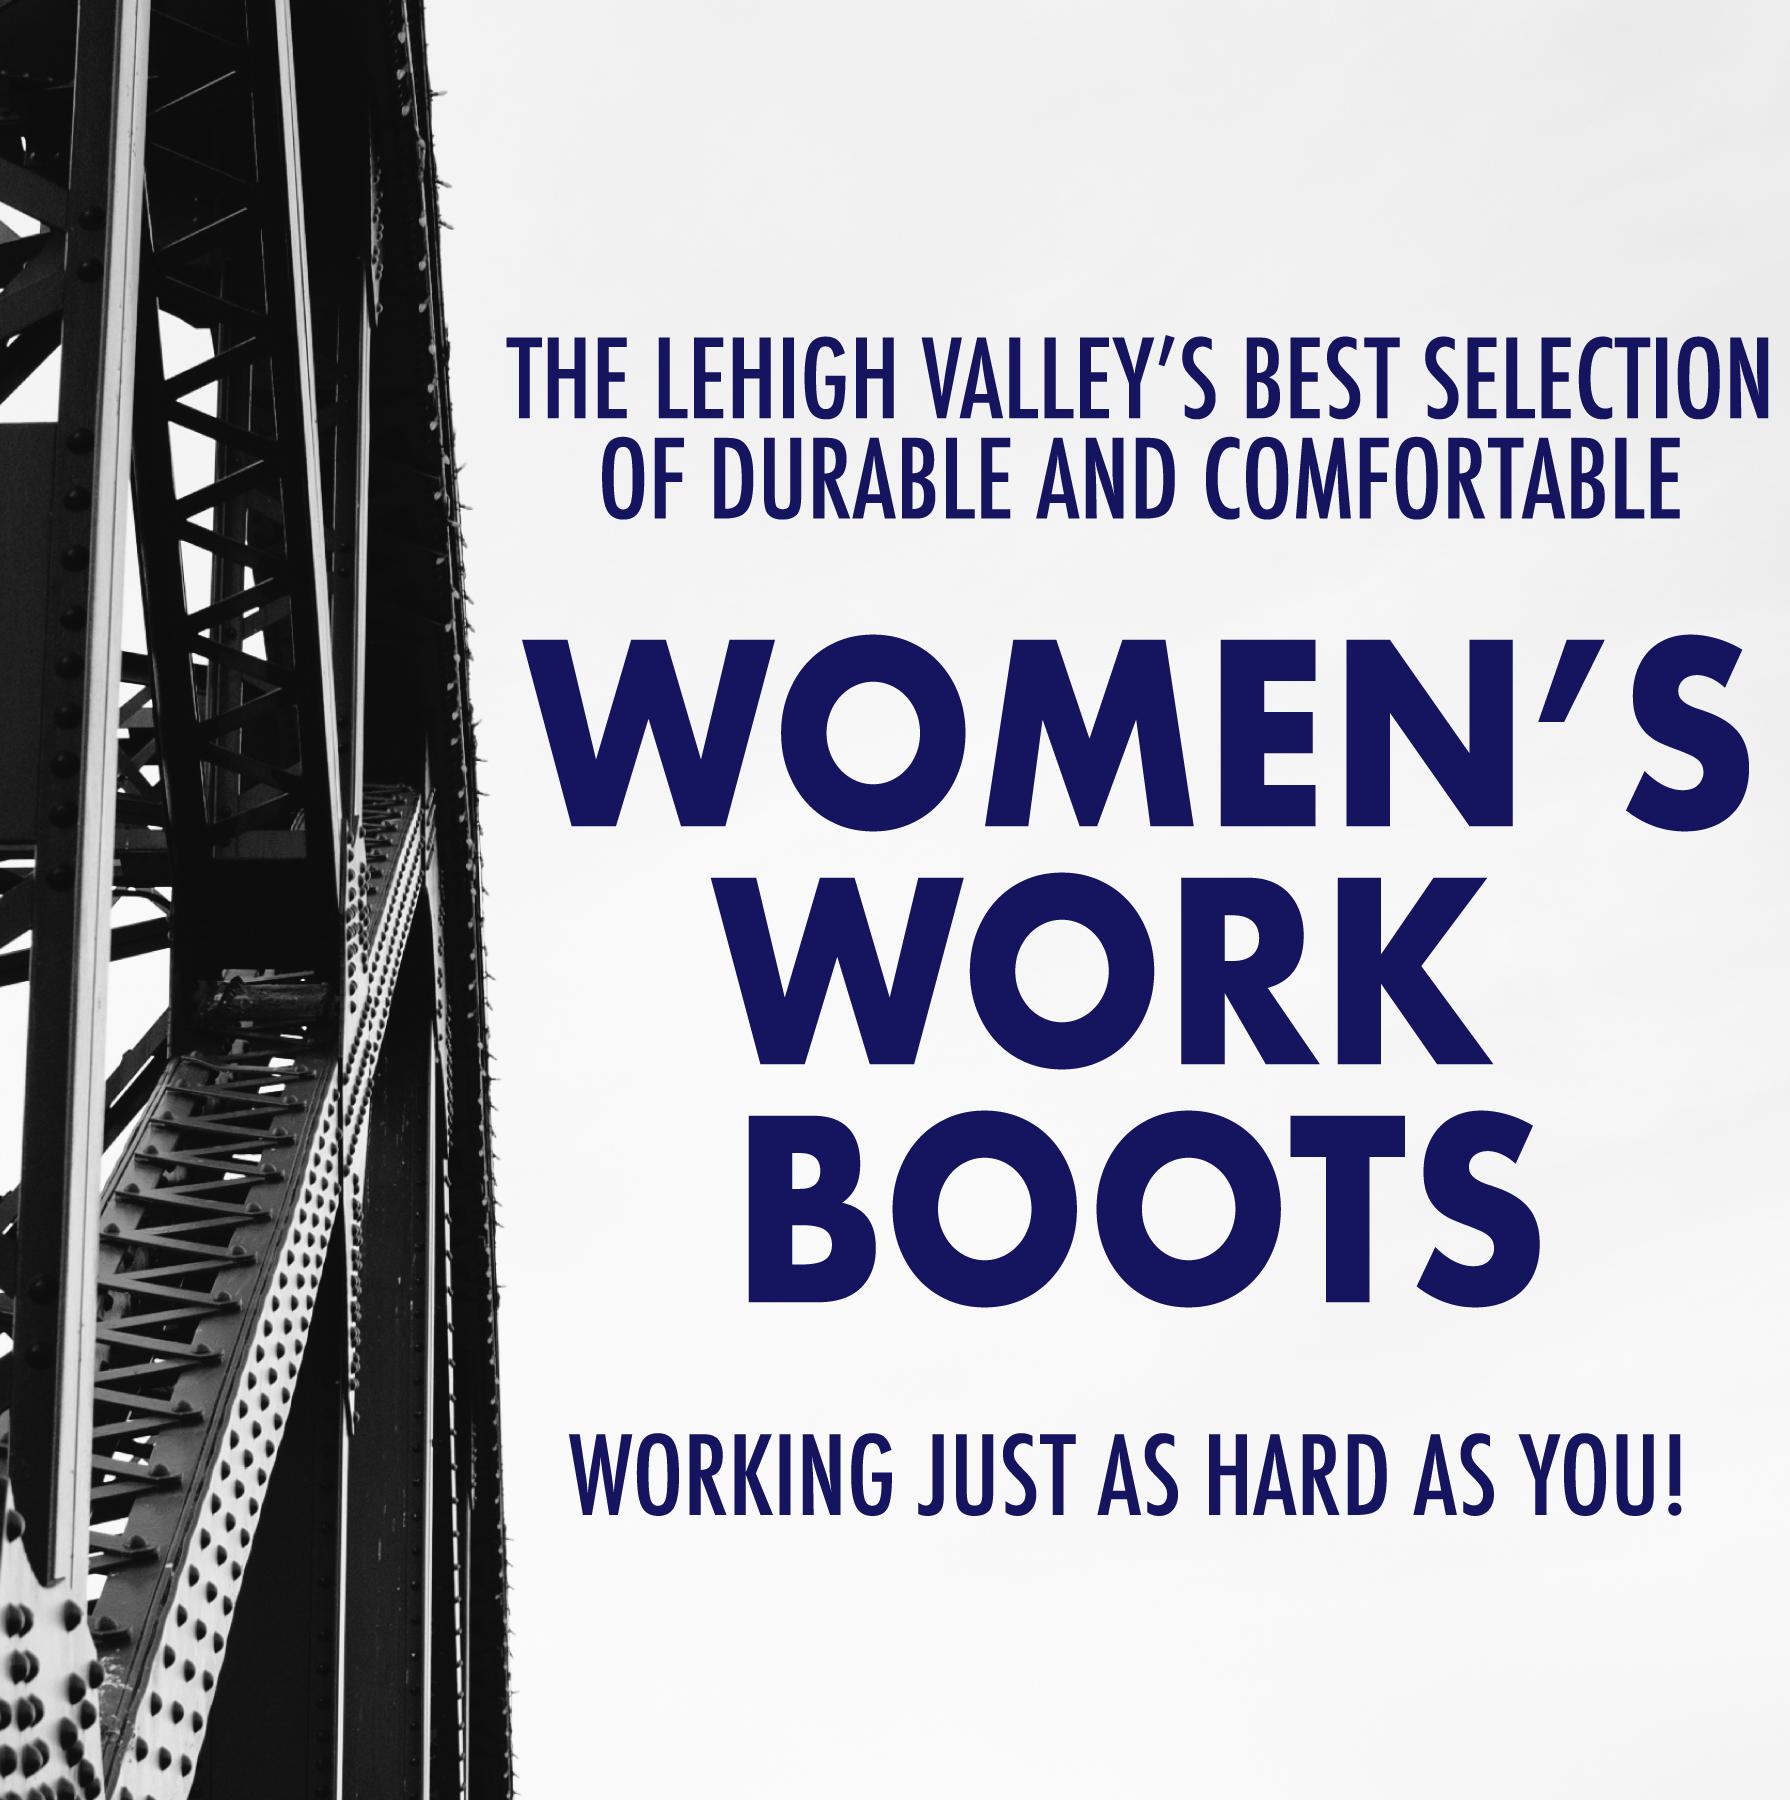 women-s-work-boots-secetion.jpg